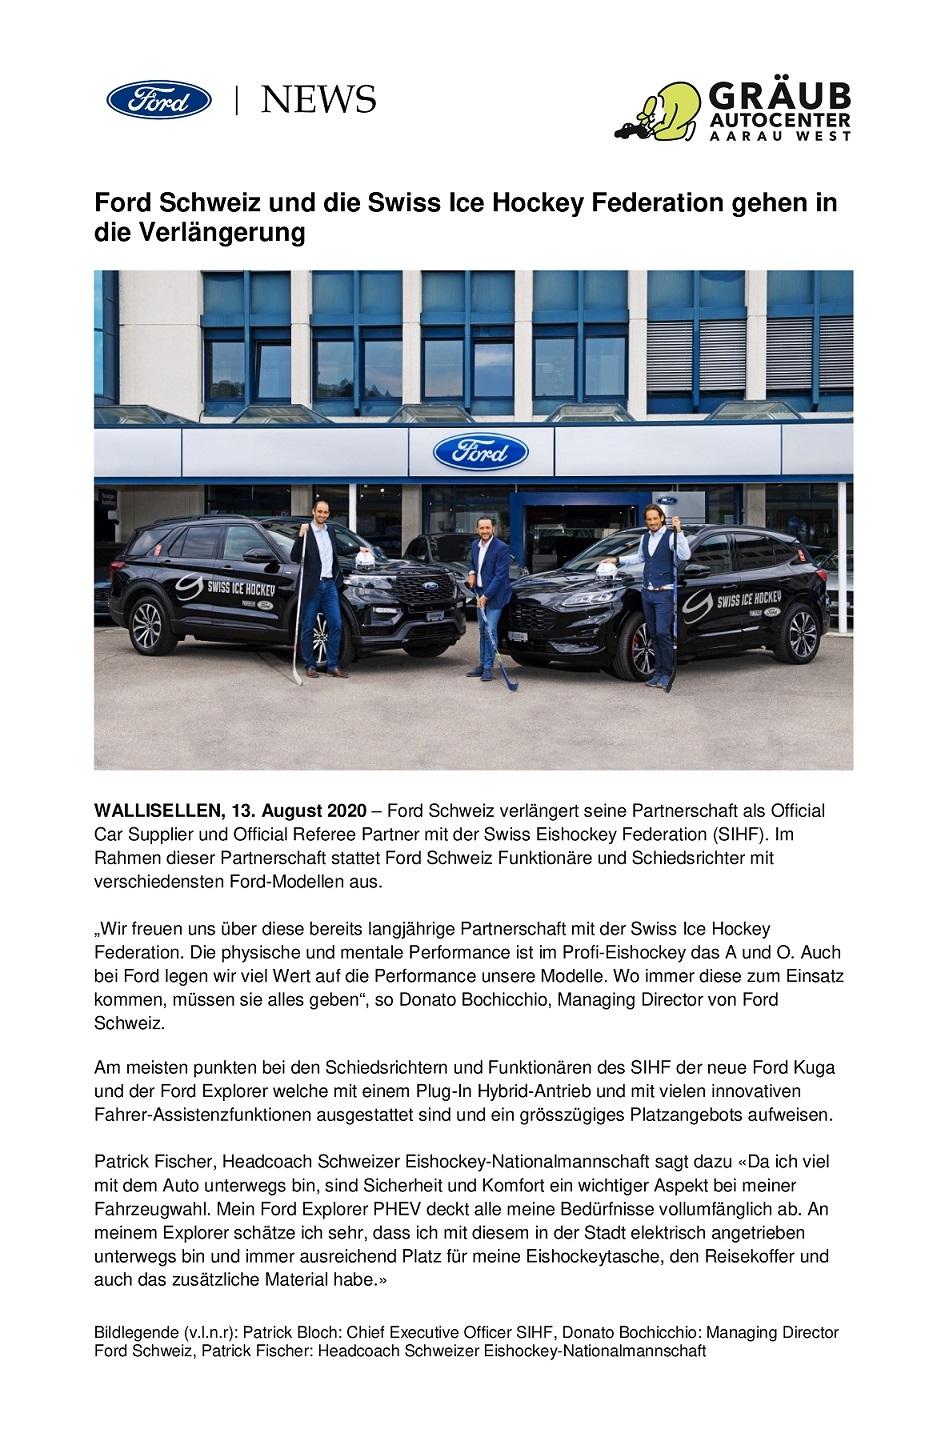 2020-Ford-verlaengert-Swiss-Ice-Hockey_Graeub1_2020-08-13Kleiner.jpg#asset:621